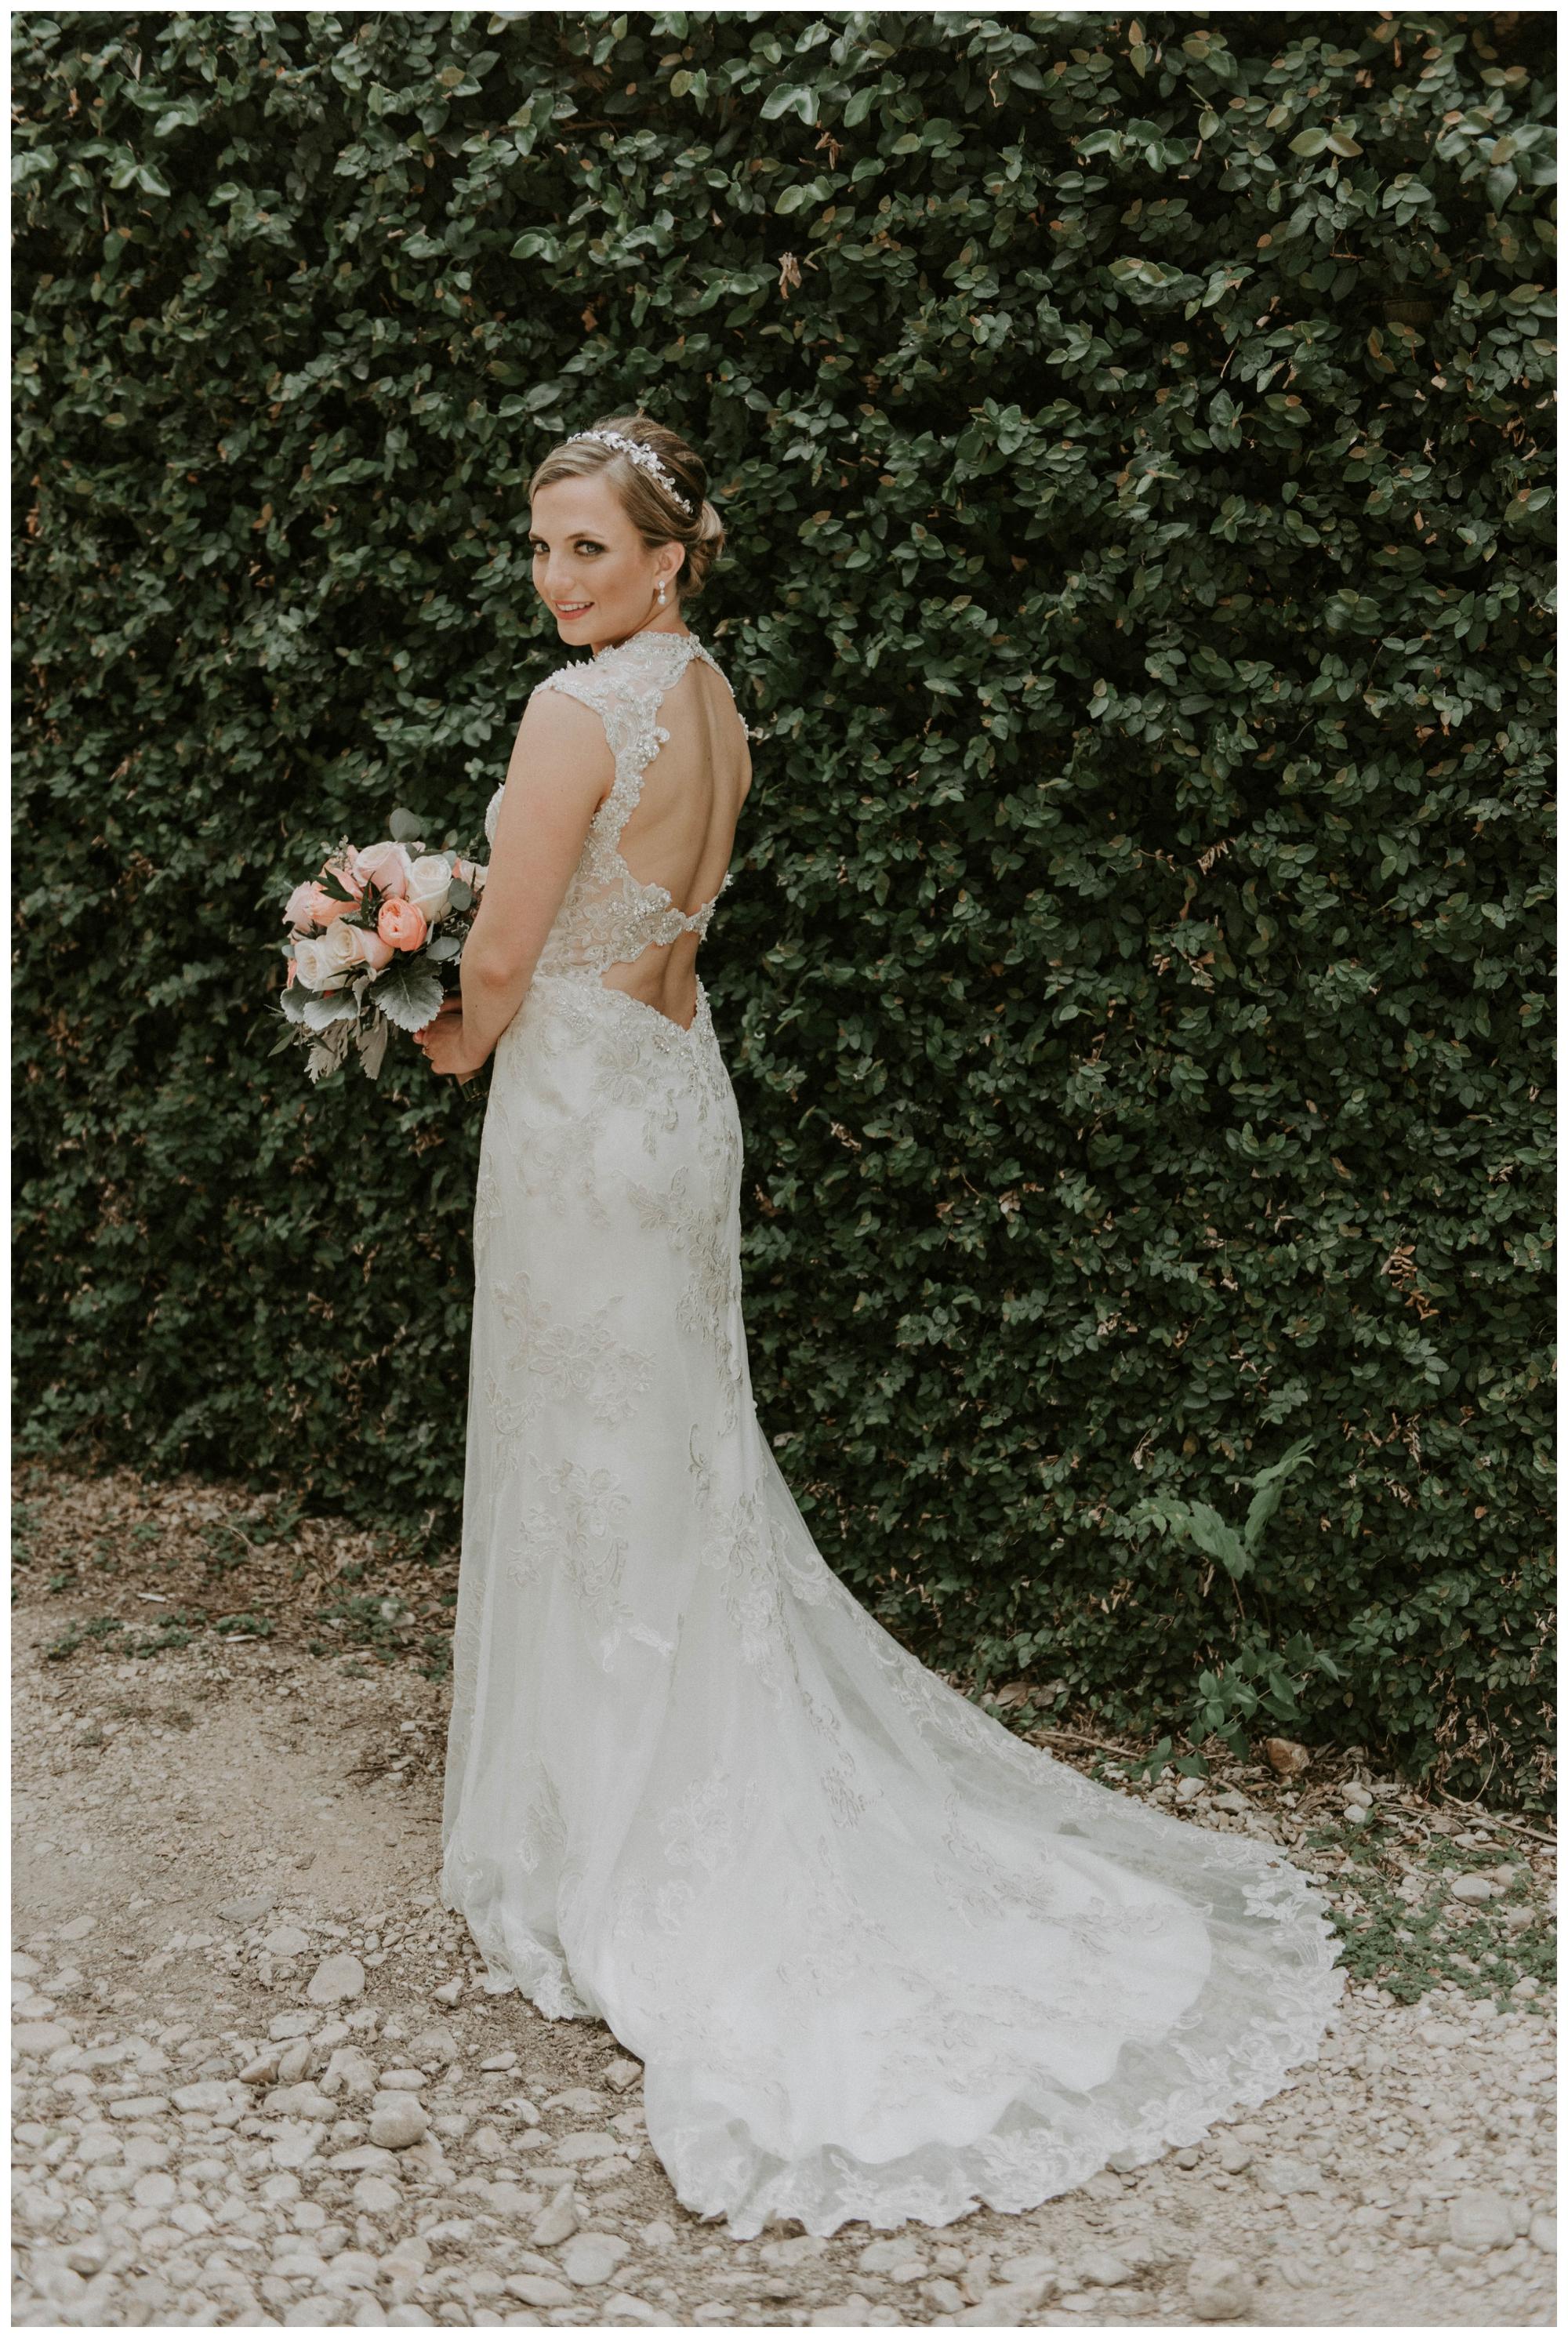 austin-texas-wedding-photography-1778-photographie_0033.jpg